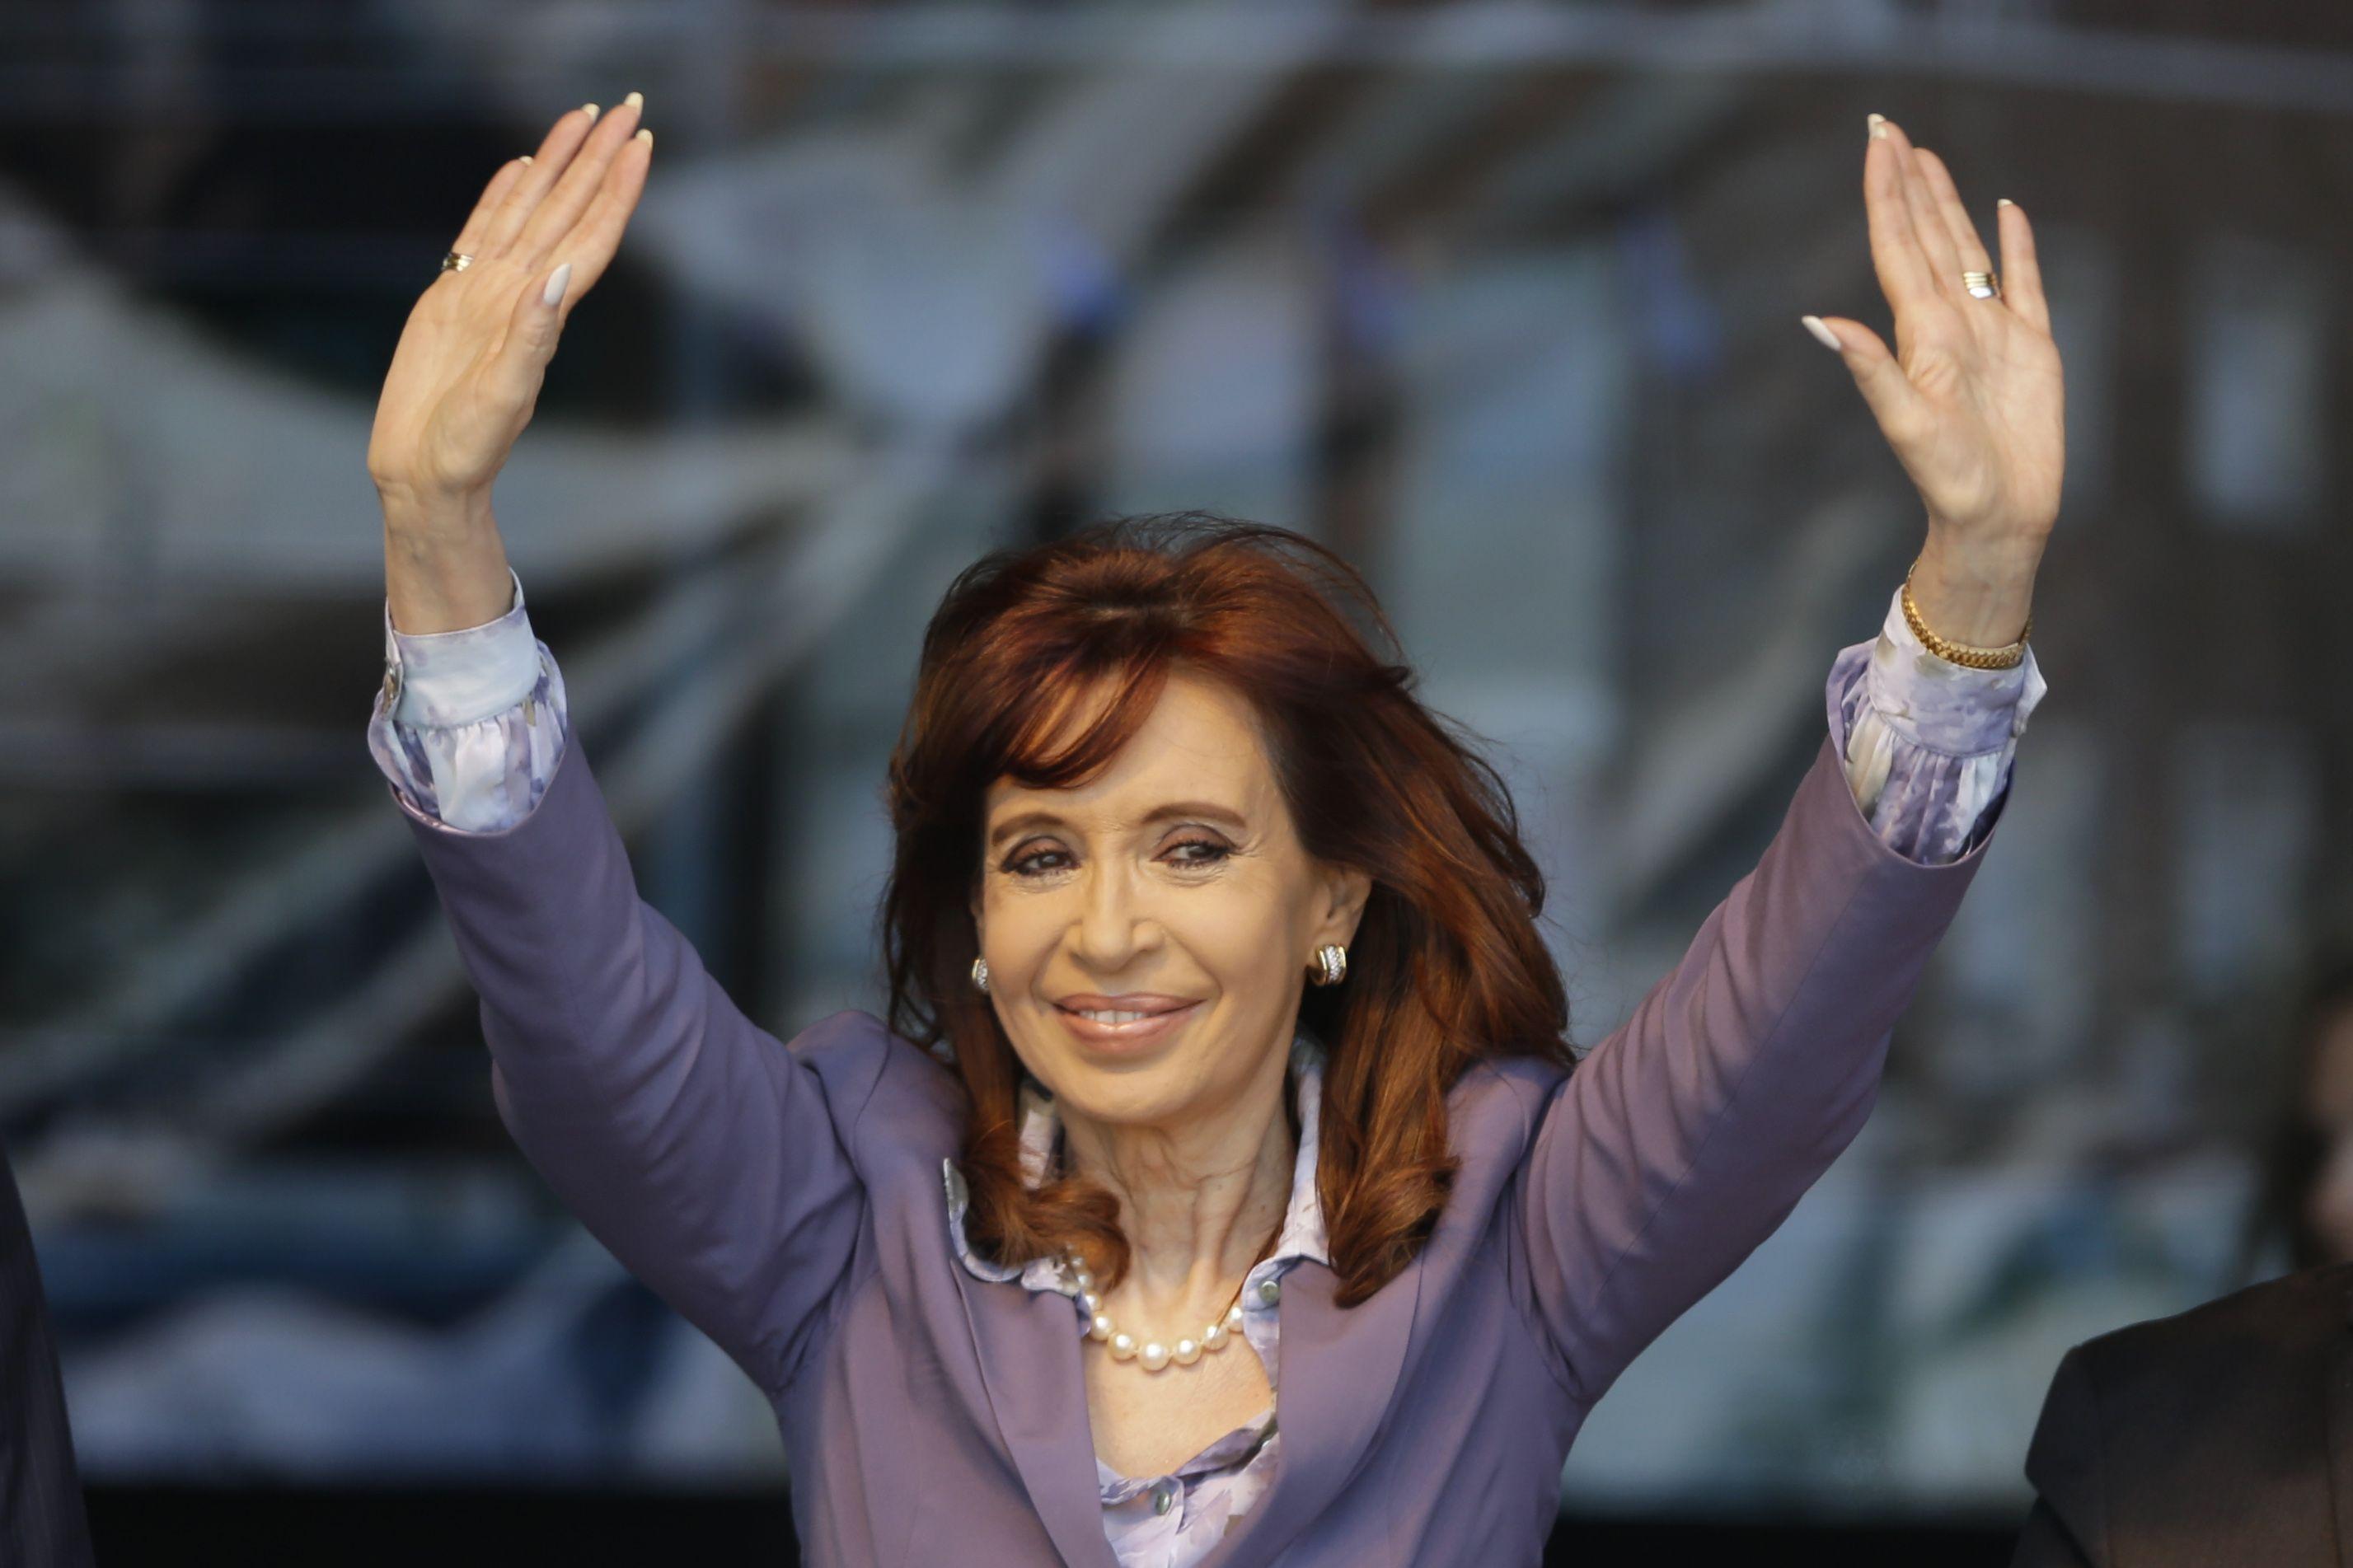 La presidenta será despedida por la agrupación kirchnerista.